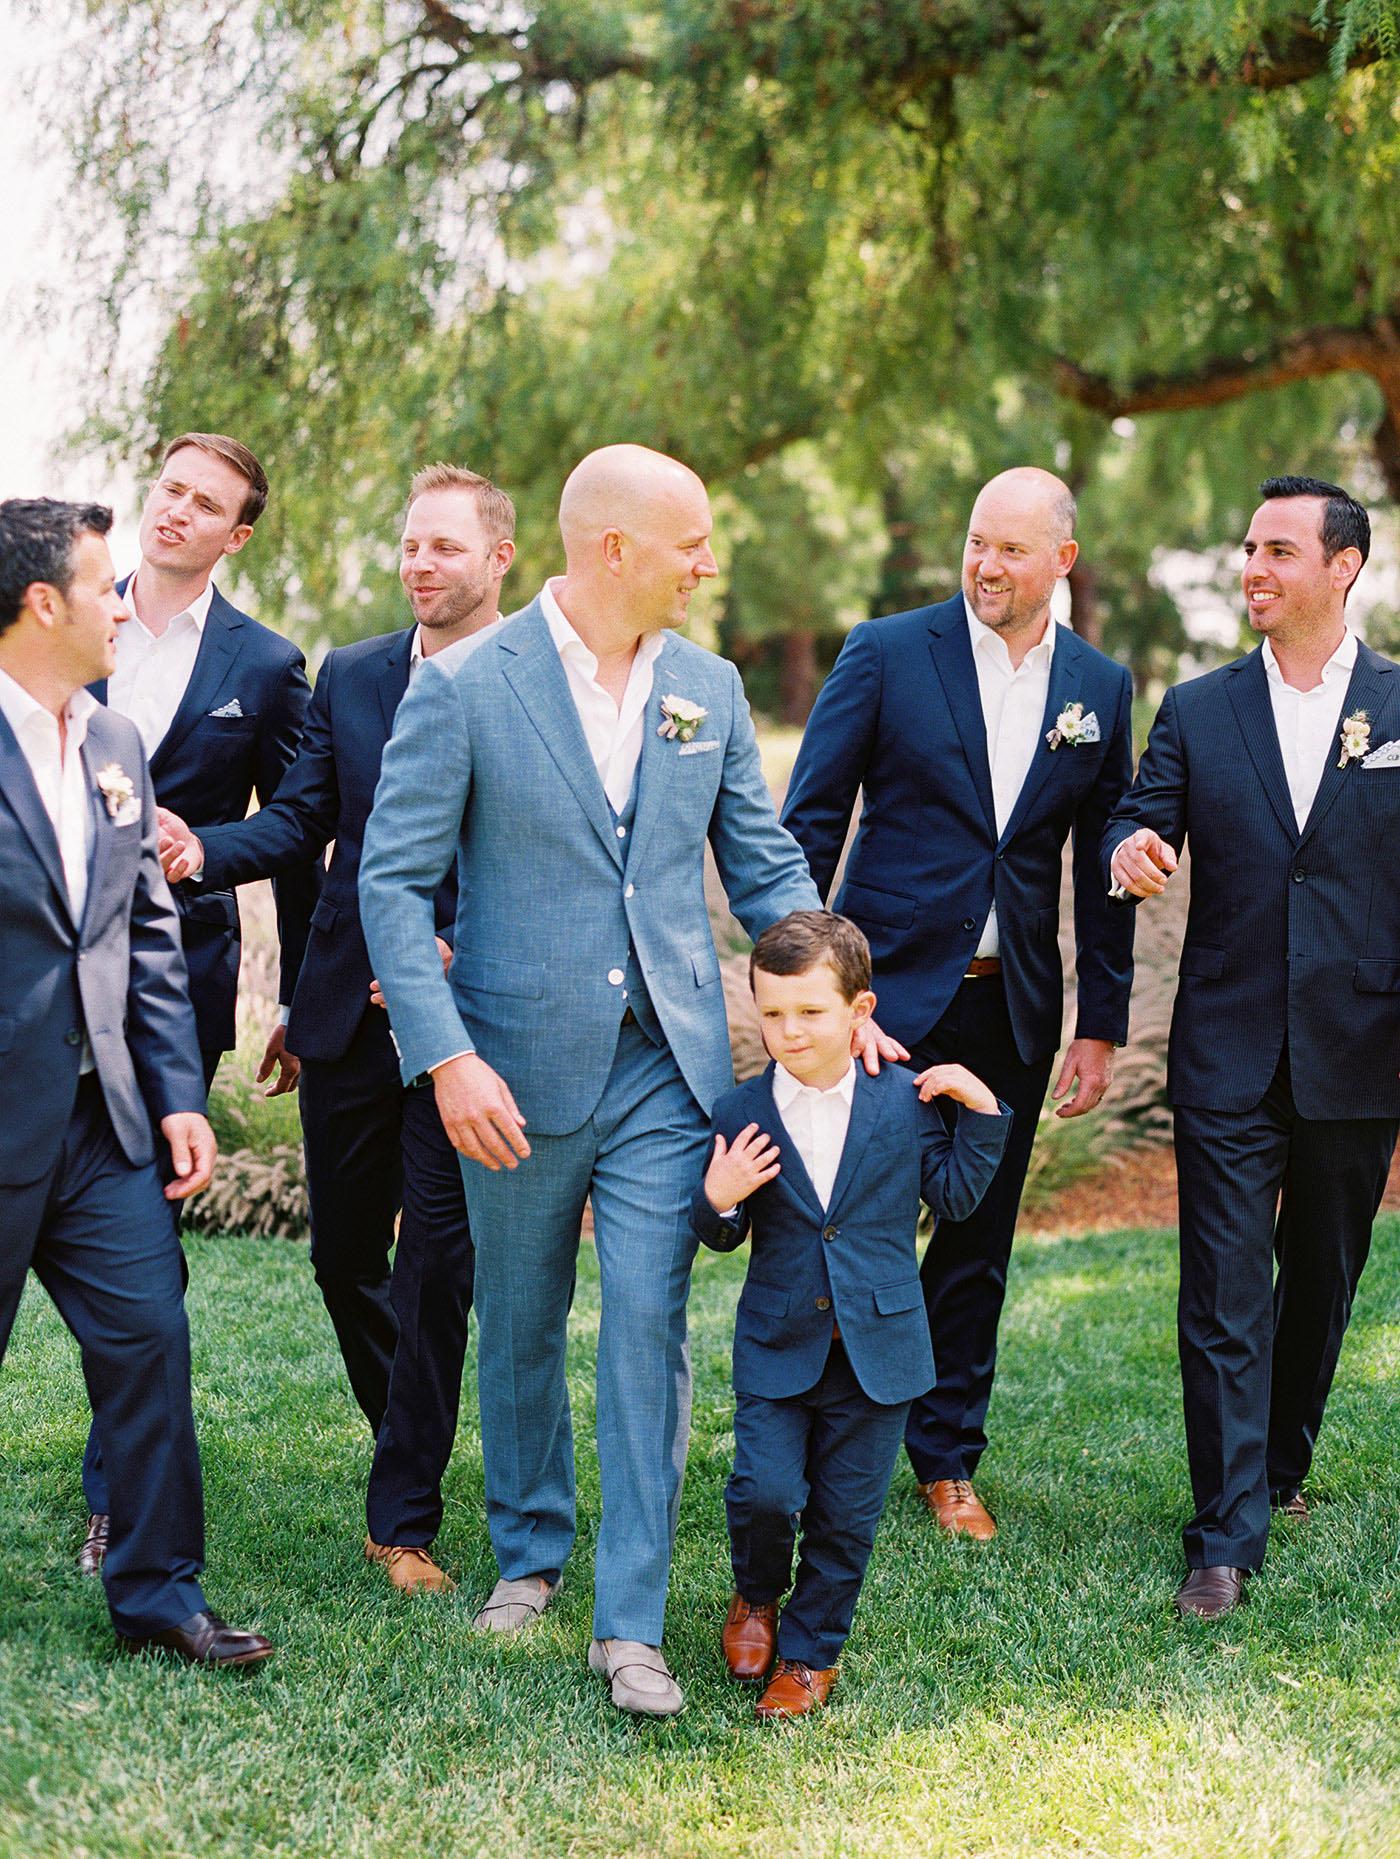 Caitlin and Fletcher wedding groomsmen and groom